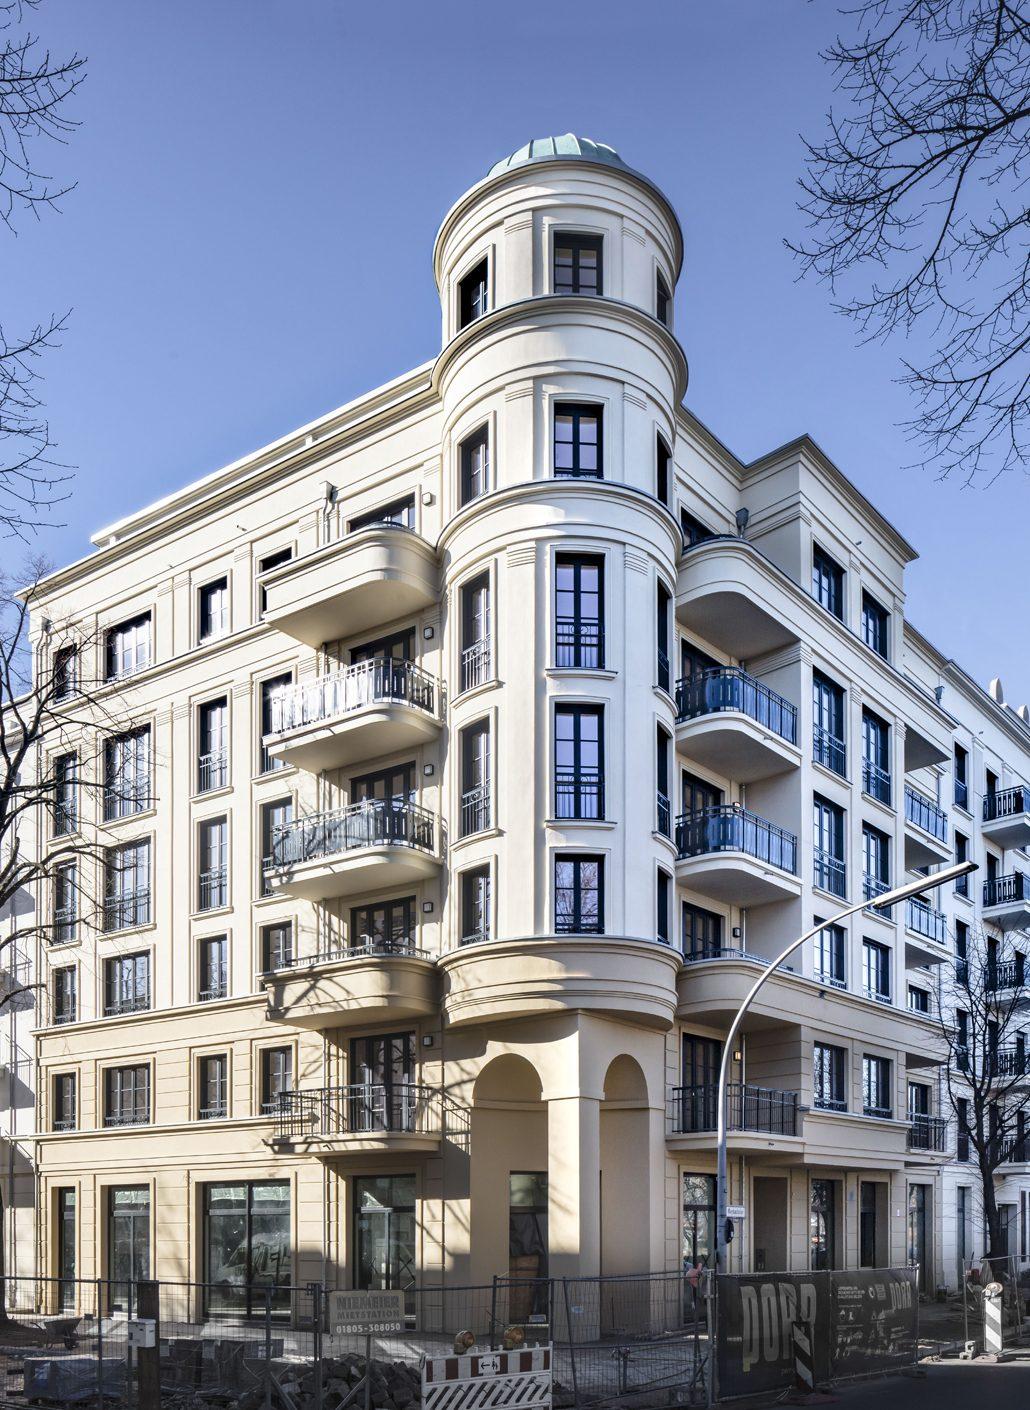 Patzschke-Neubauprojekt in Berlin, Maybachufer 36-38, Bild: Patzschke Architekten